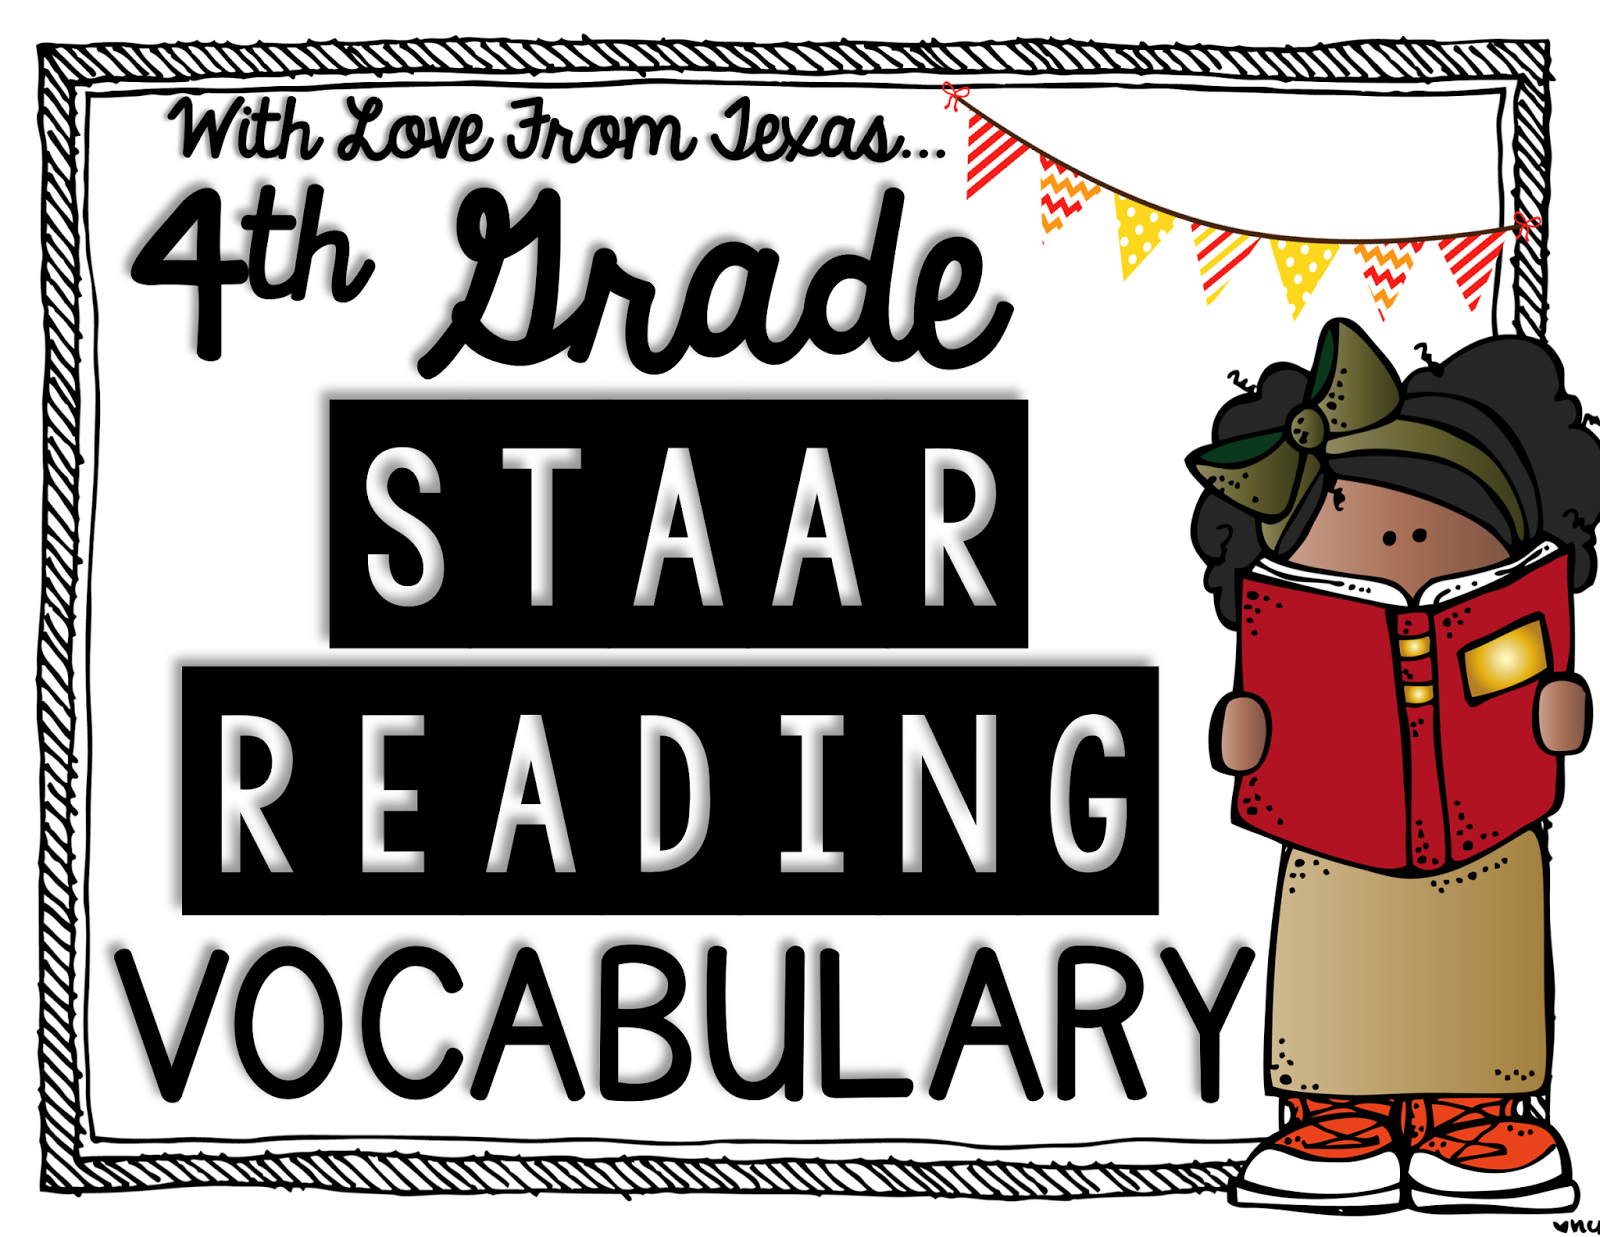 4th grade readng clipart clip art stock Reading STAAR Vocabulary. 4th grade reading vocabulary   TEKS   4th ... clip art stock